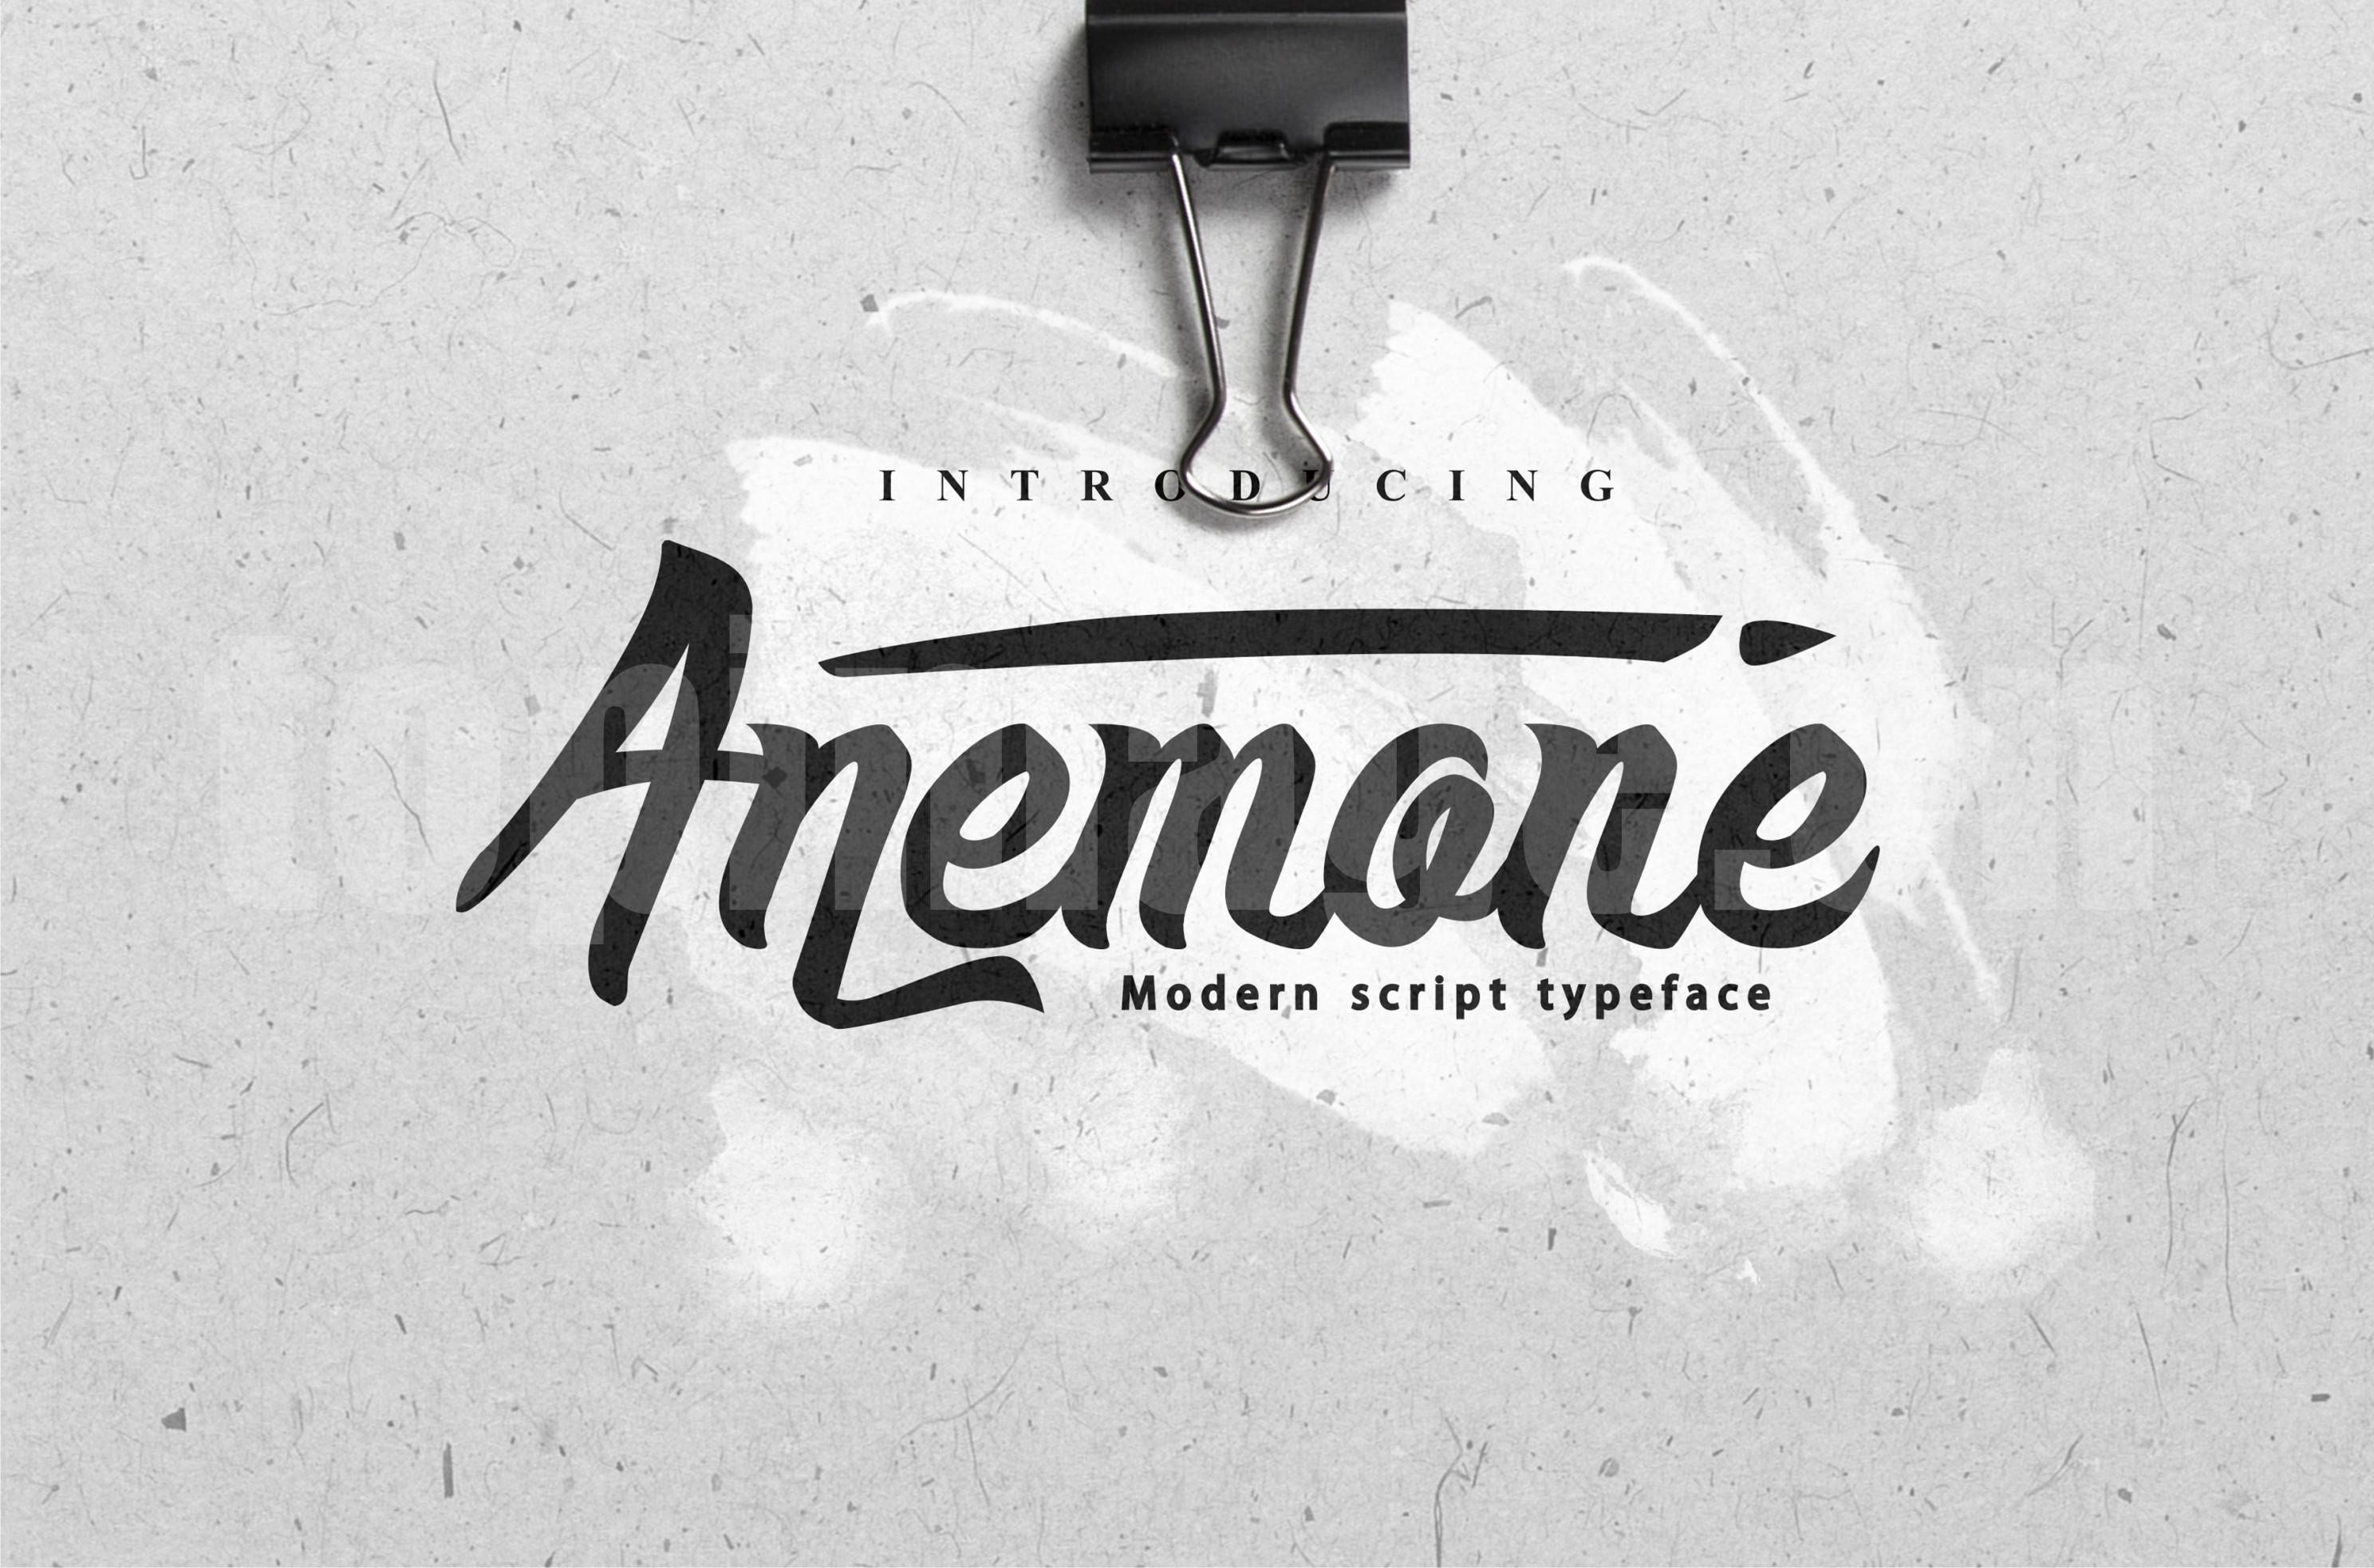 Anemone手写手绘书法艺术飘逸英文字体下载